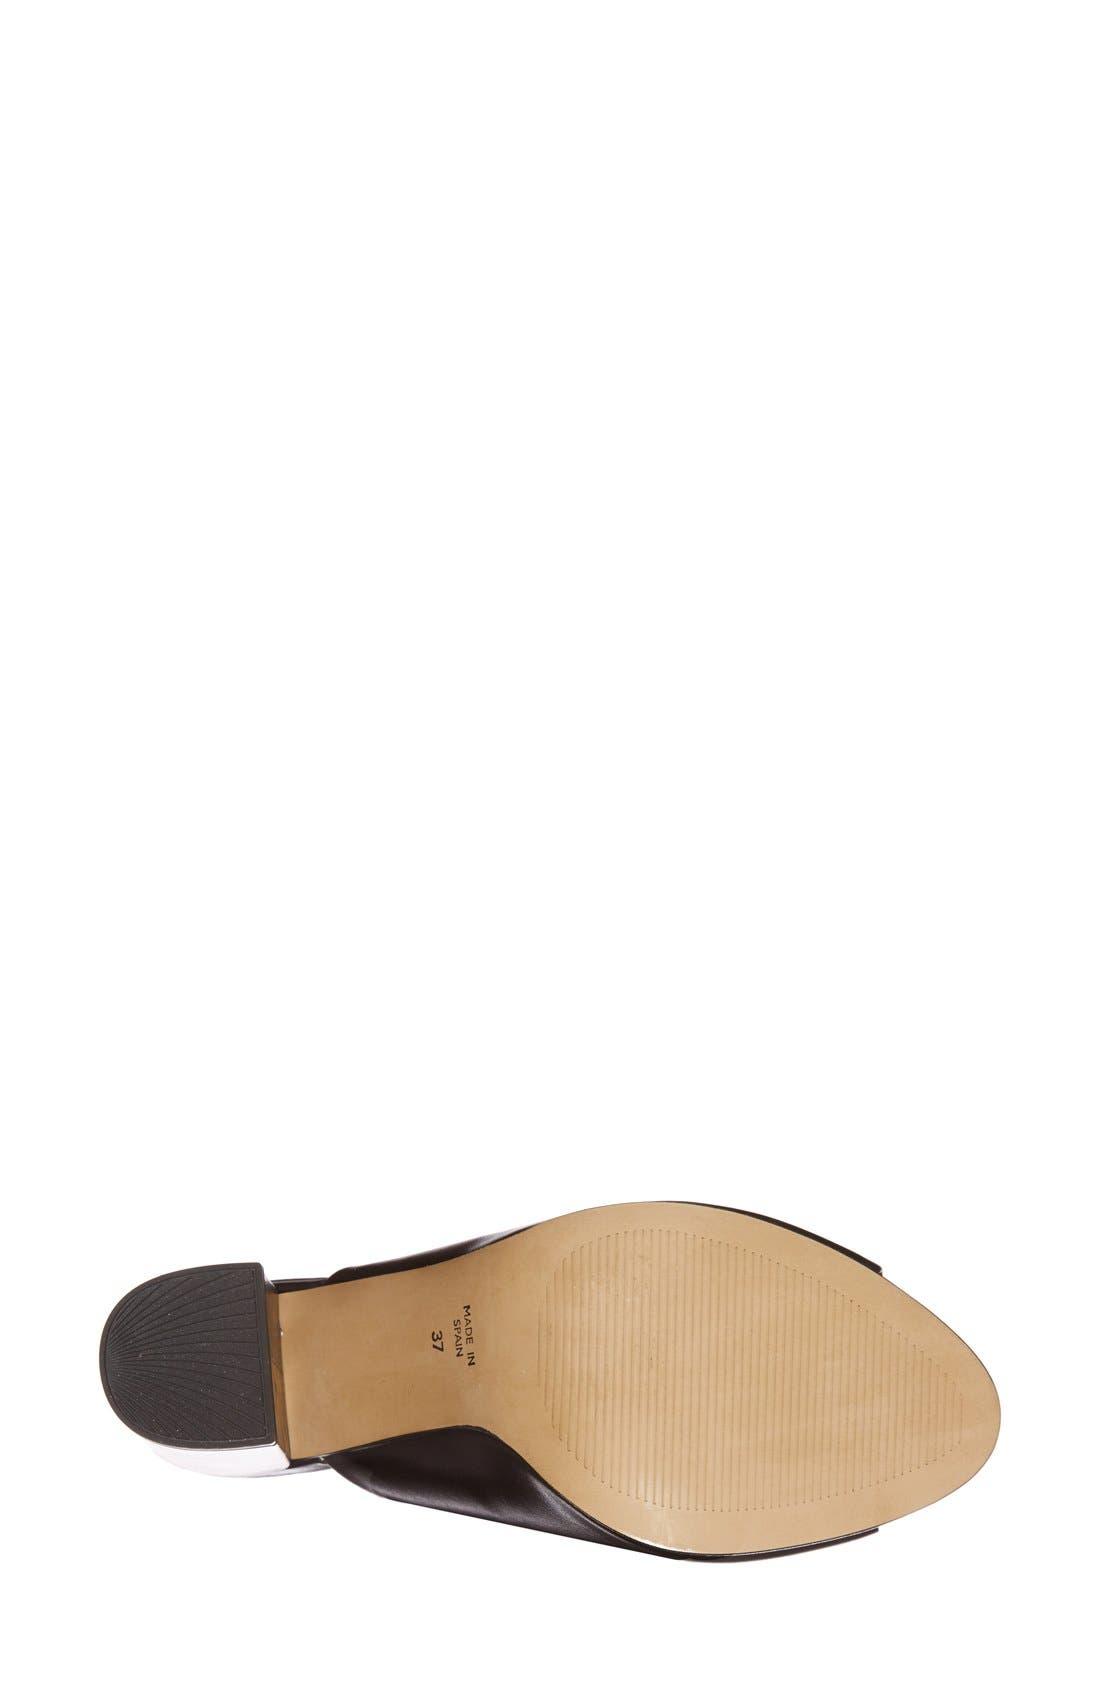 'Glacial' Mule Sandal,                             Alternate thumbnail 3, color,                             001